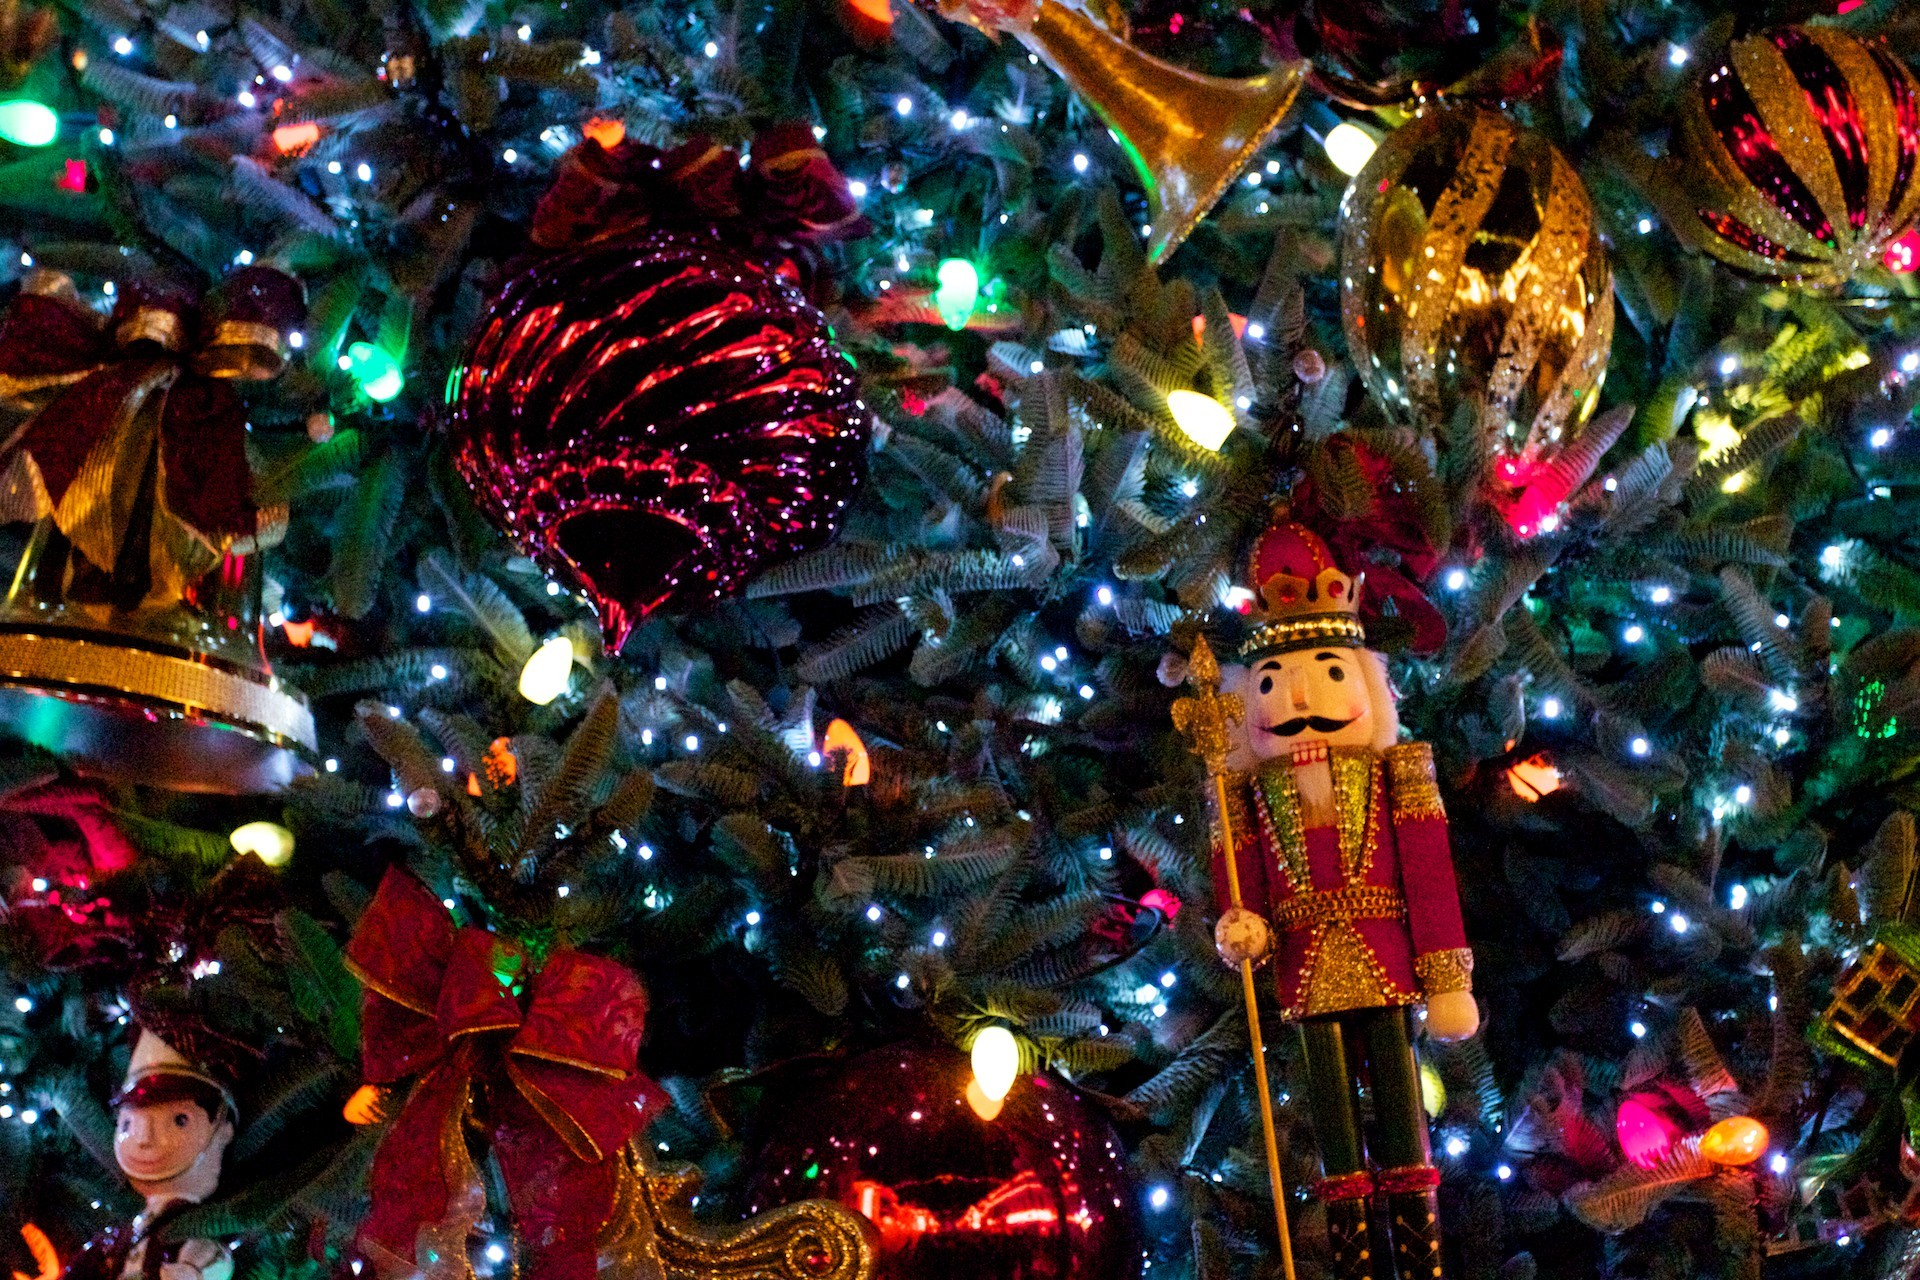 45 christmas tree wallpapers download free awesome full hd 1920x1280 christmas tree desktop wallpaper 2015 grasscloth wallpaper voltagebd Gallery